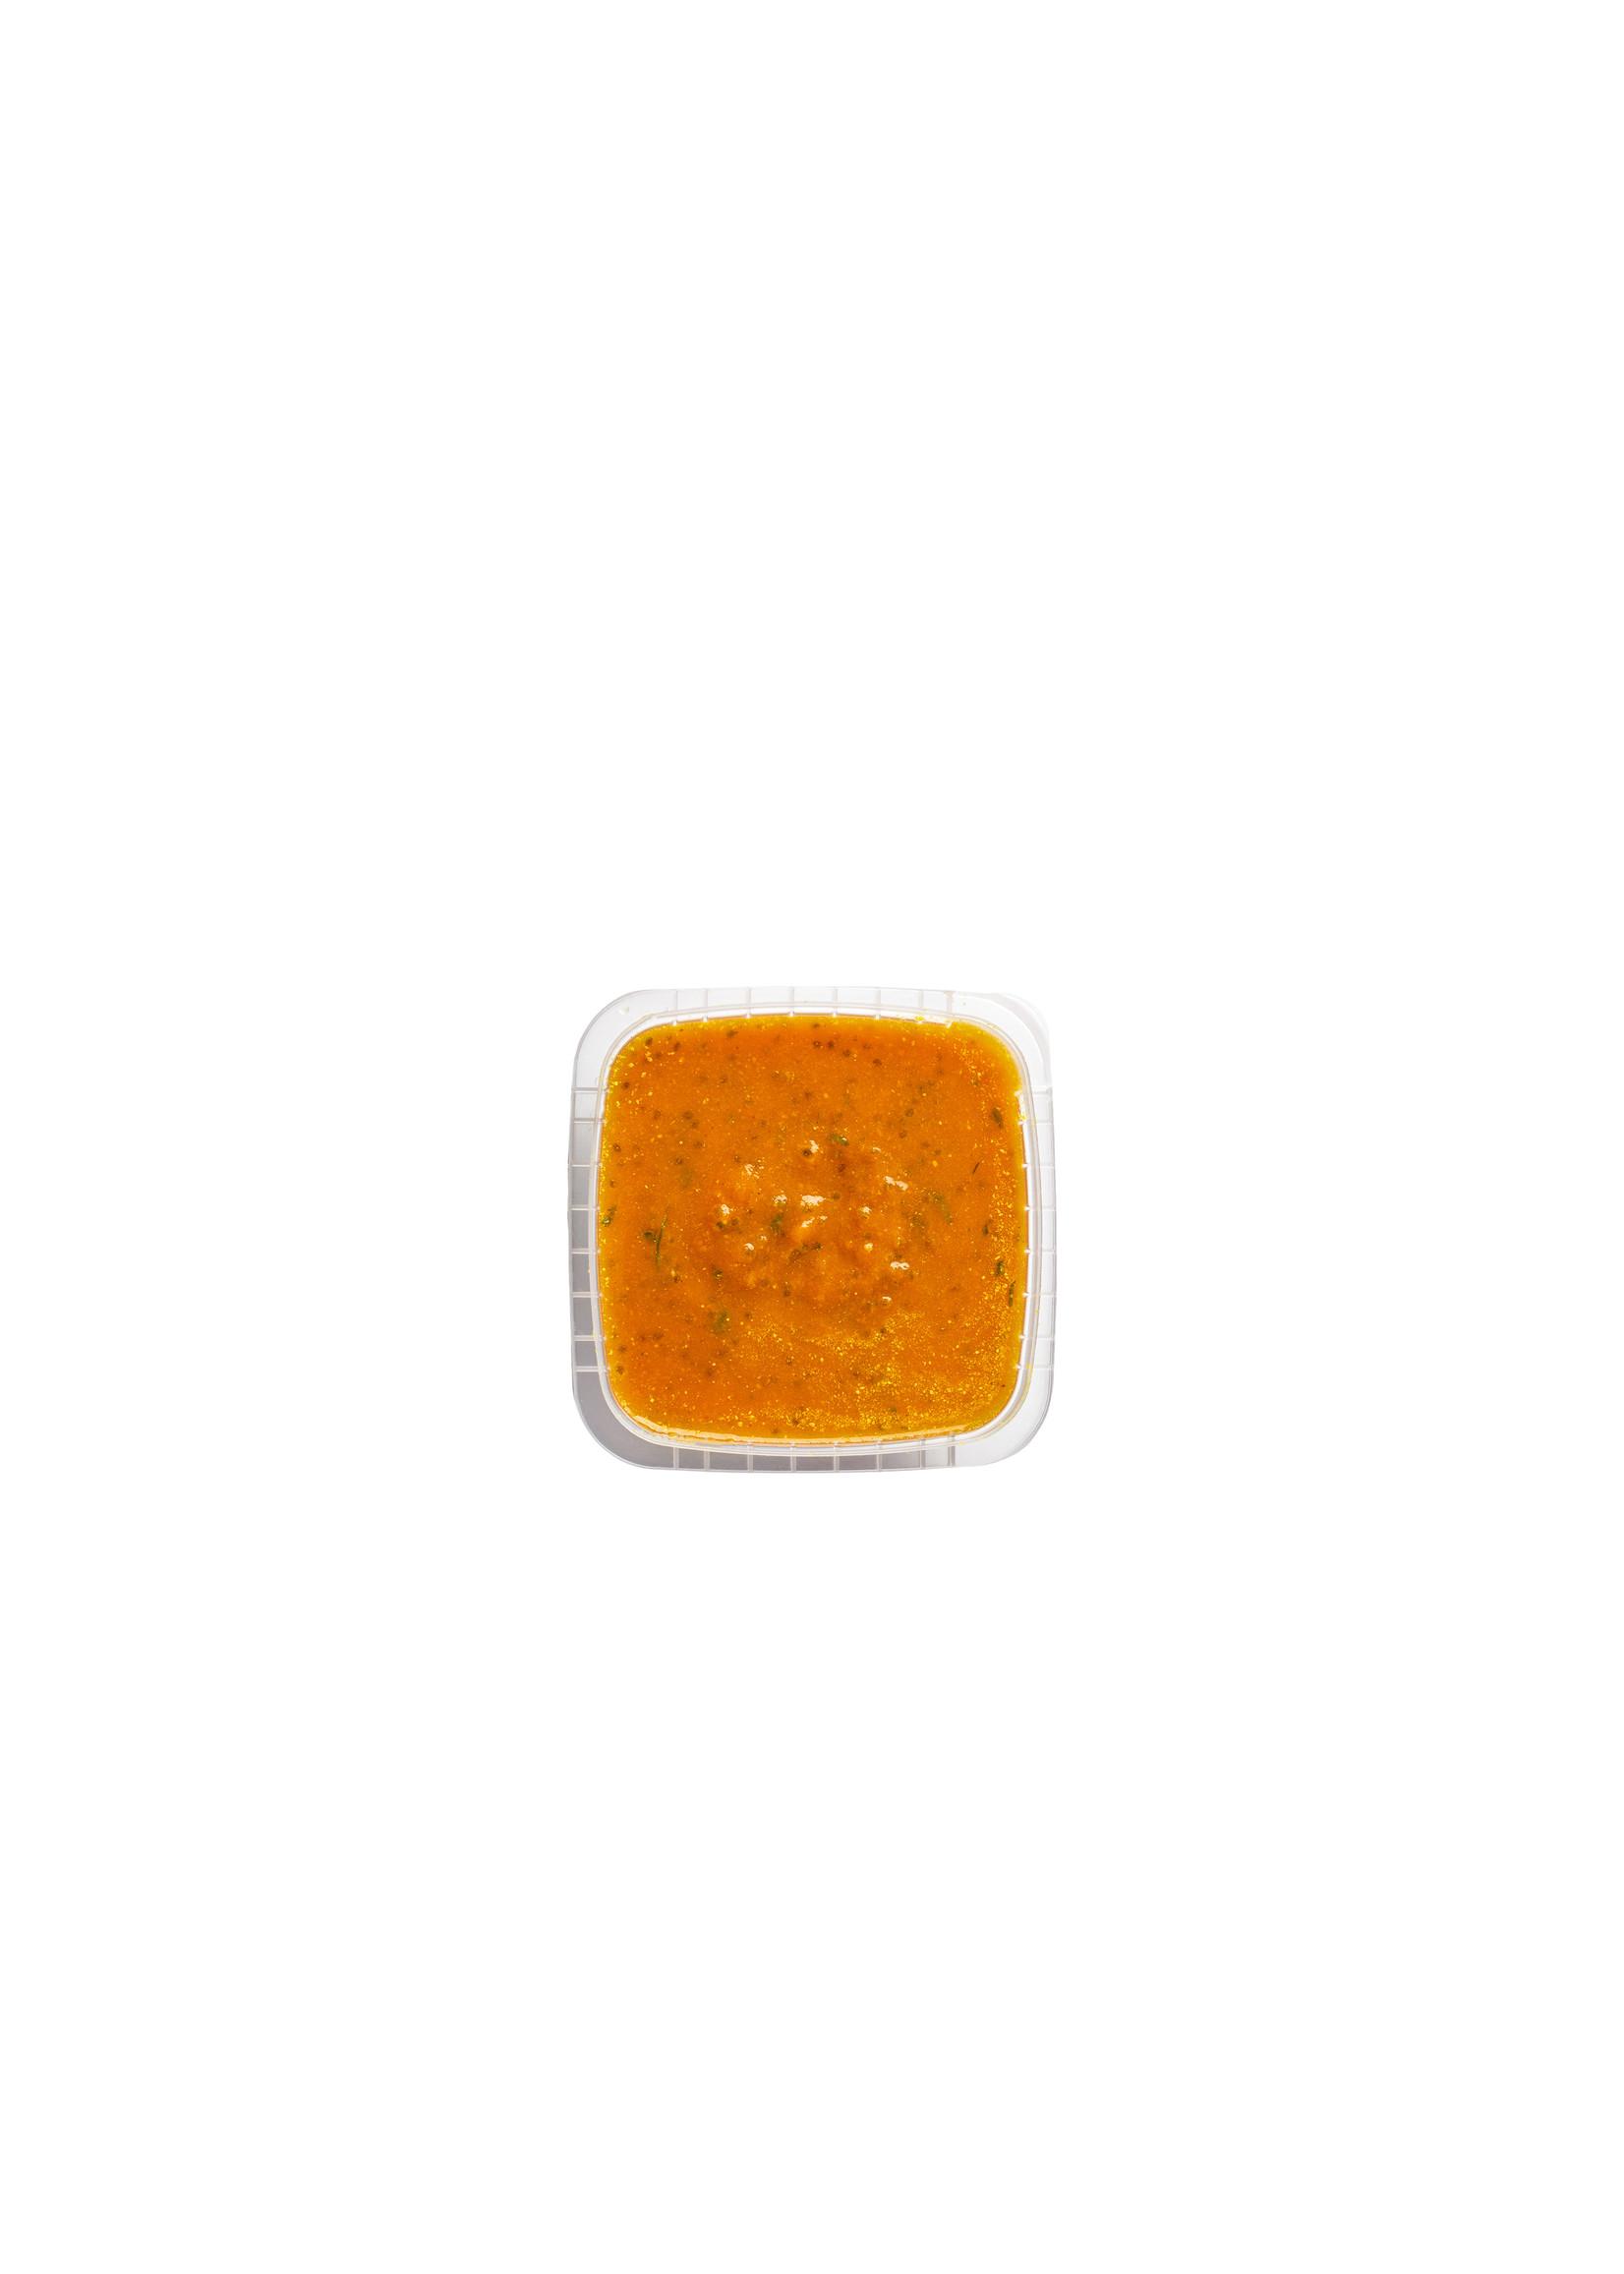 PRIMAL PET FOODS Primal Elixir Winter Squash 16 oz.